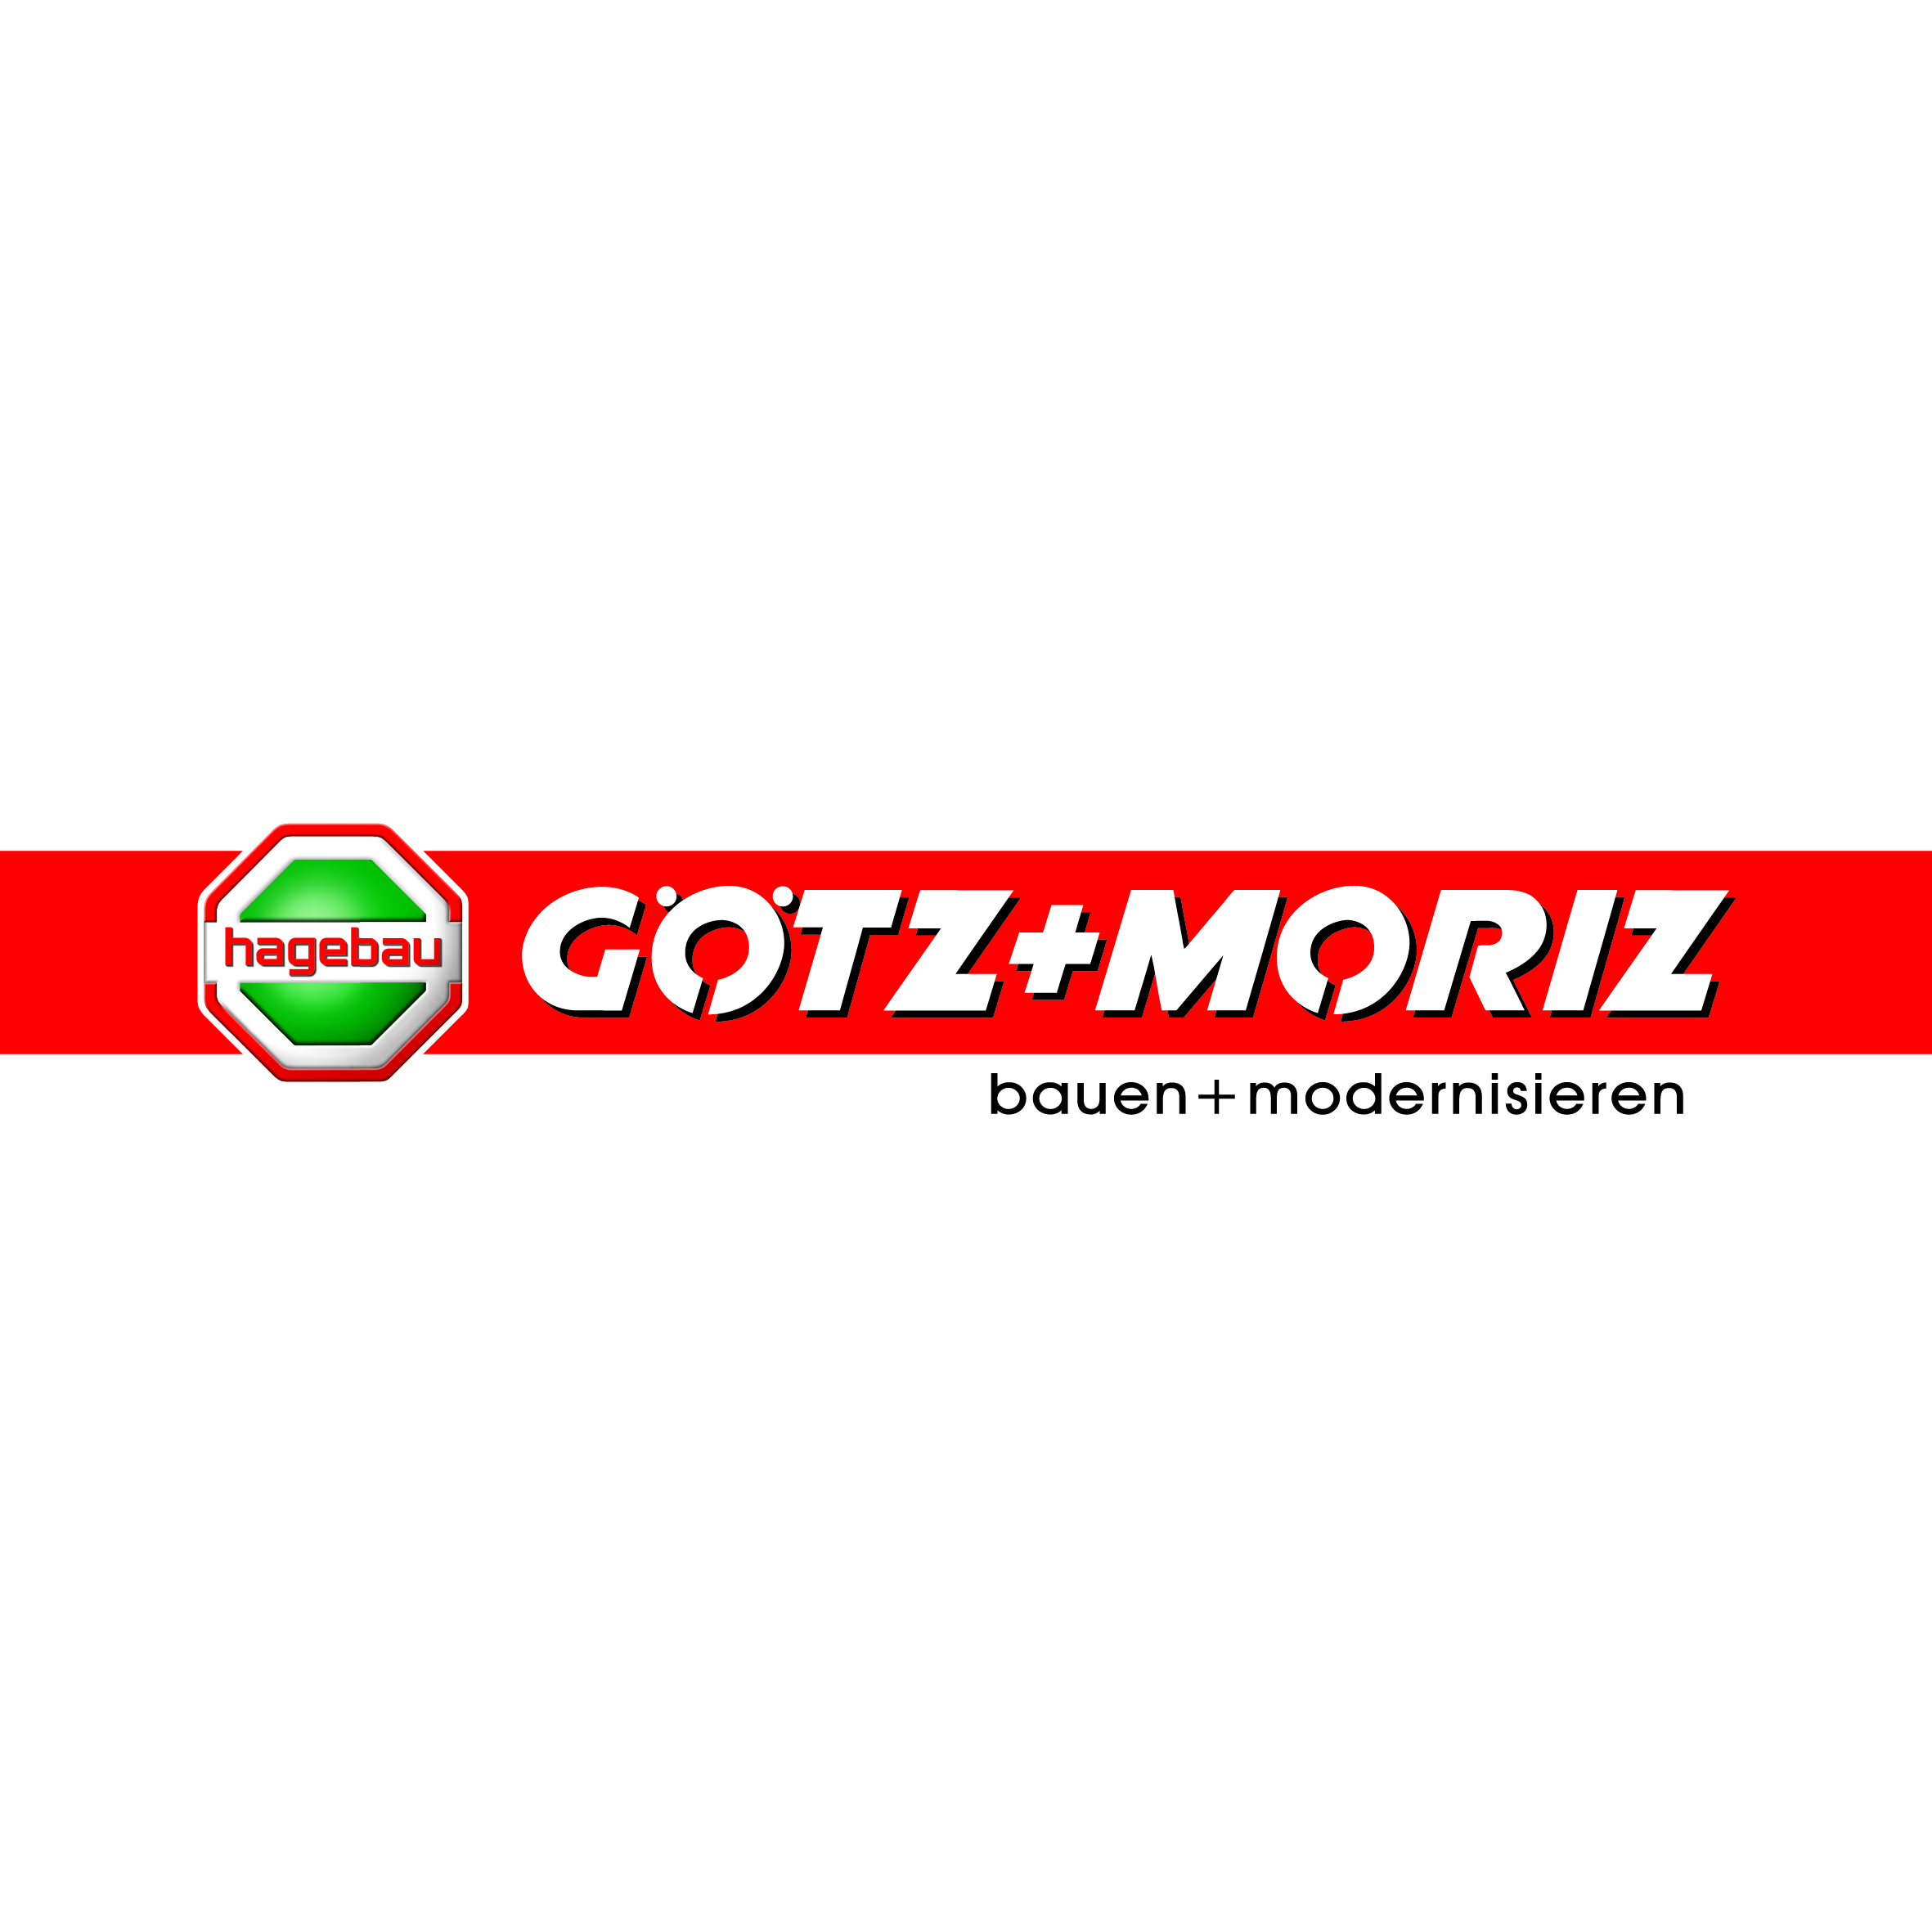 Götz + Moriz GmbH in Freiburg im Breisgau